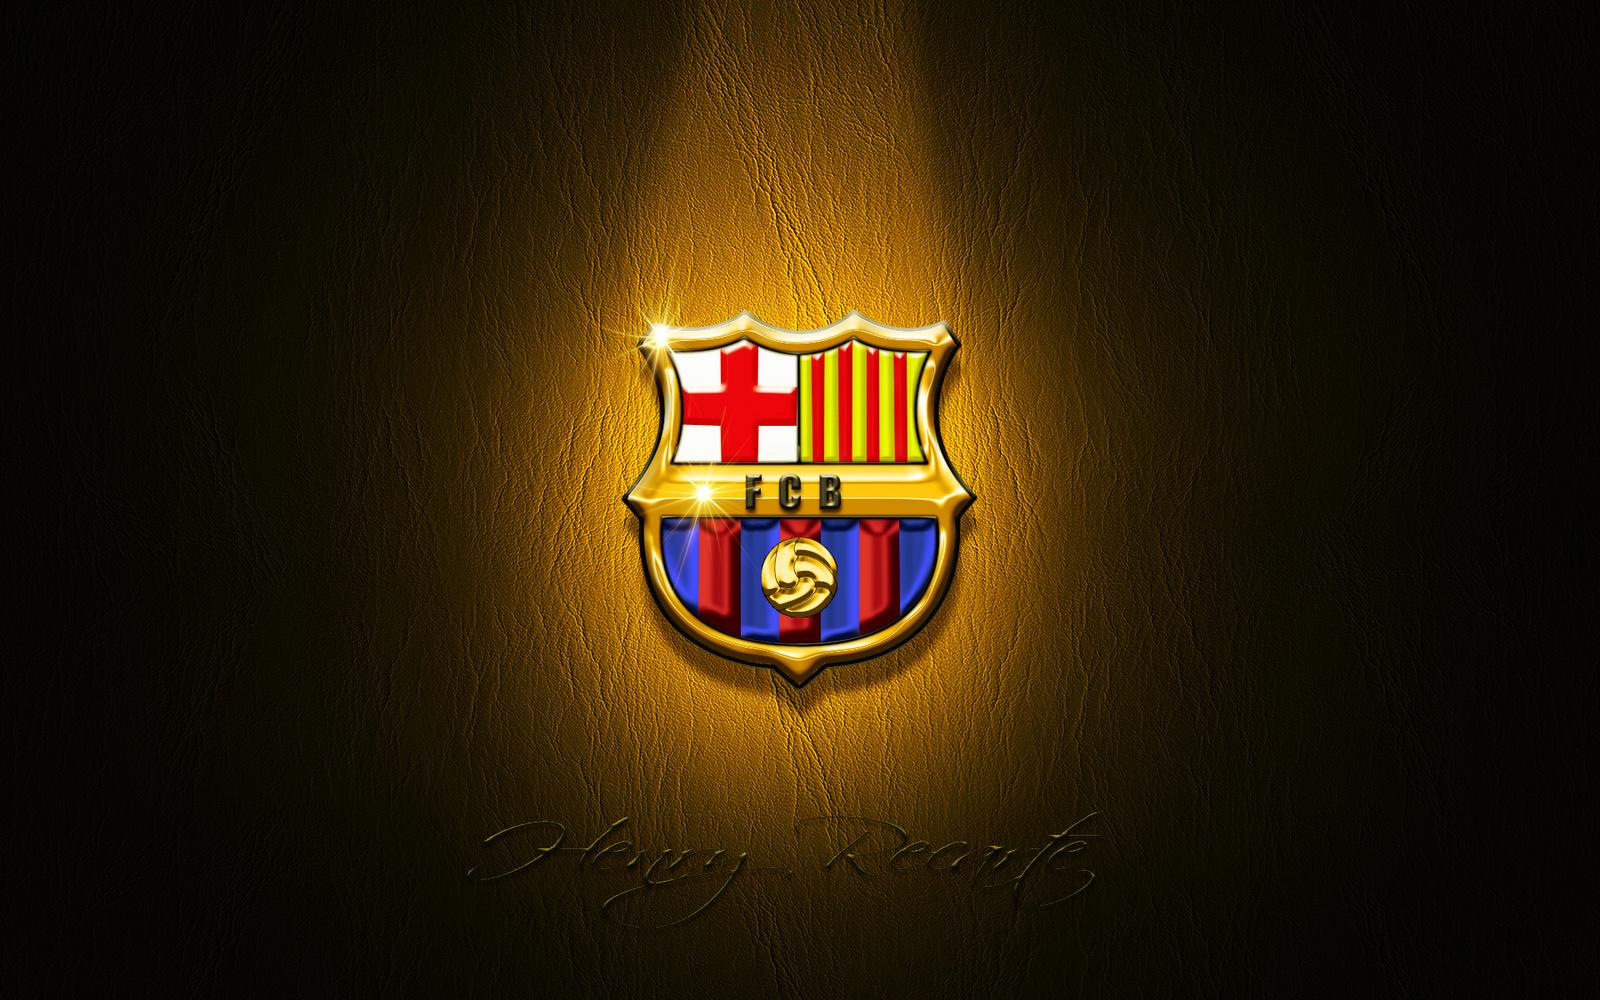 FC Barcelona 2013 HD Wallpapers 1600x1000